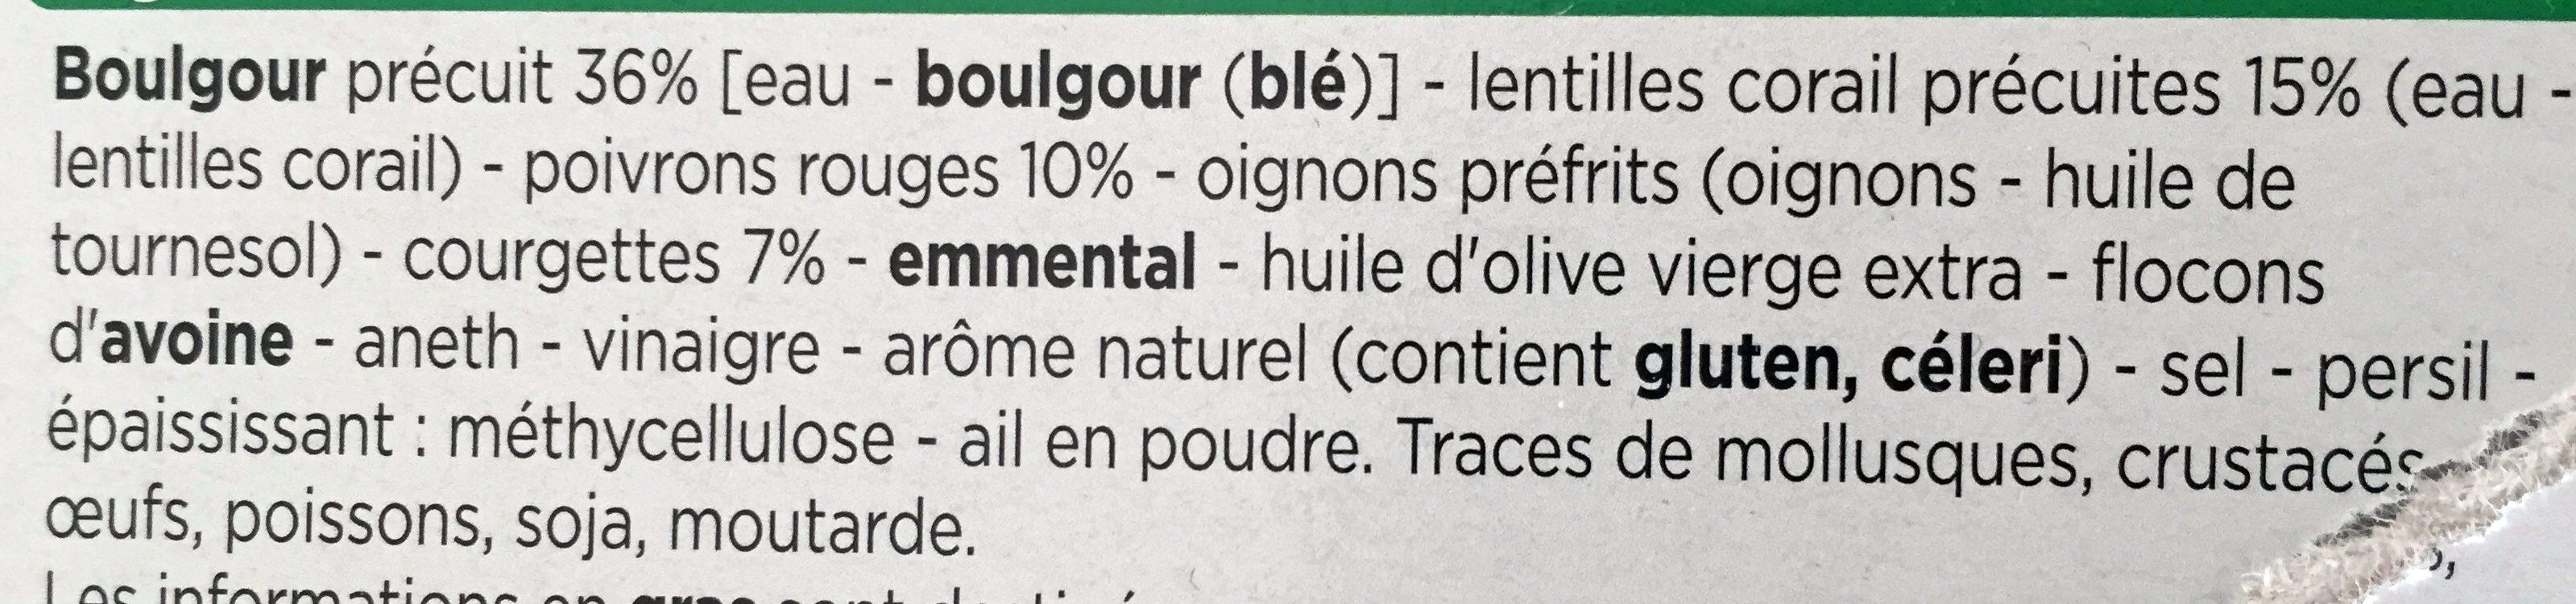 Galettes Boulgour et Lentilles Corail - Ingrediënten - fr